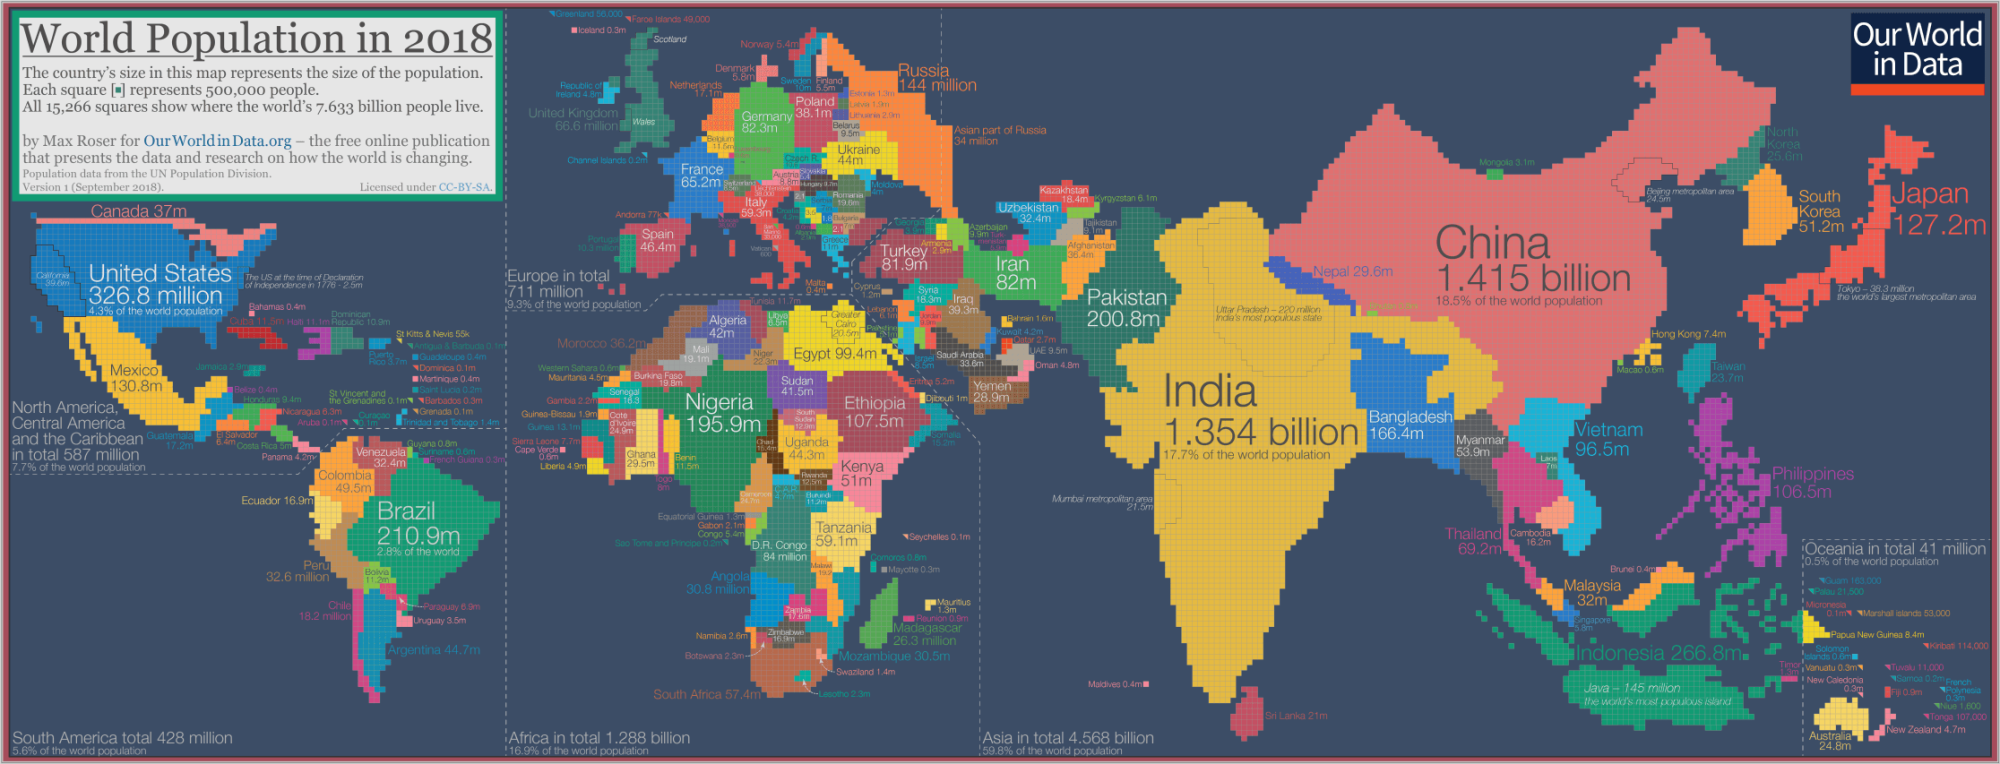 https://www.visualcapitalist.com/wp-content/uploads/2018/09/population-cartogram.html